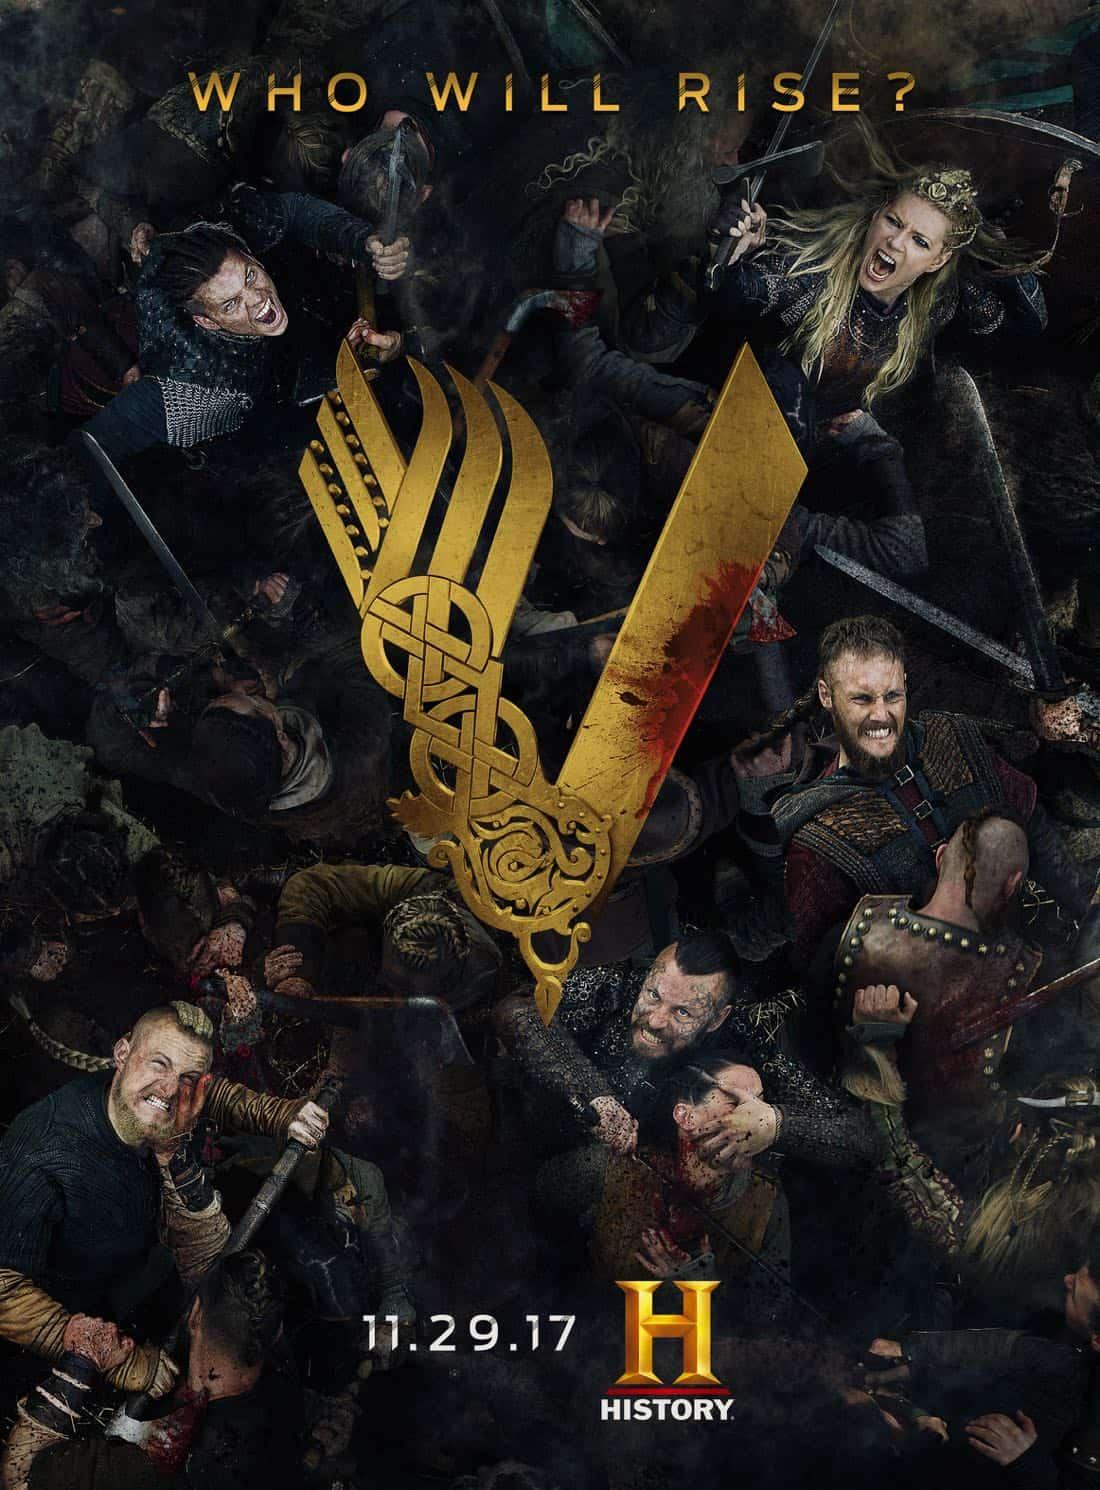 Vikings Tv Series Images Season 5 Promotional Poster Hd Wallpaper